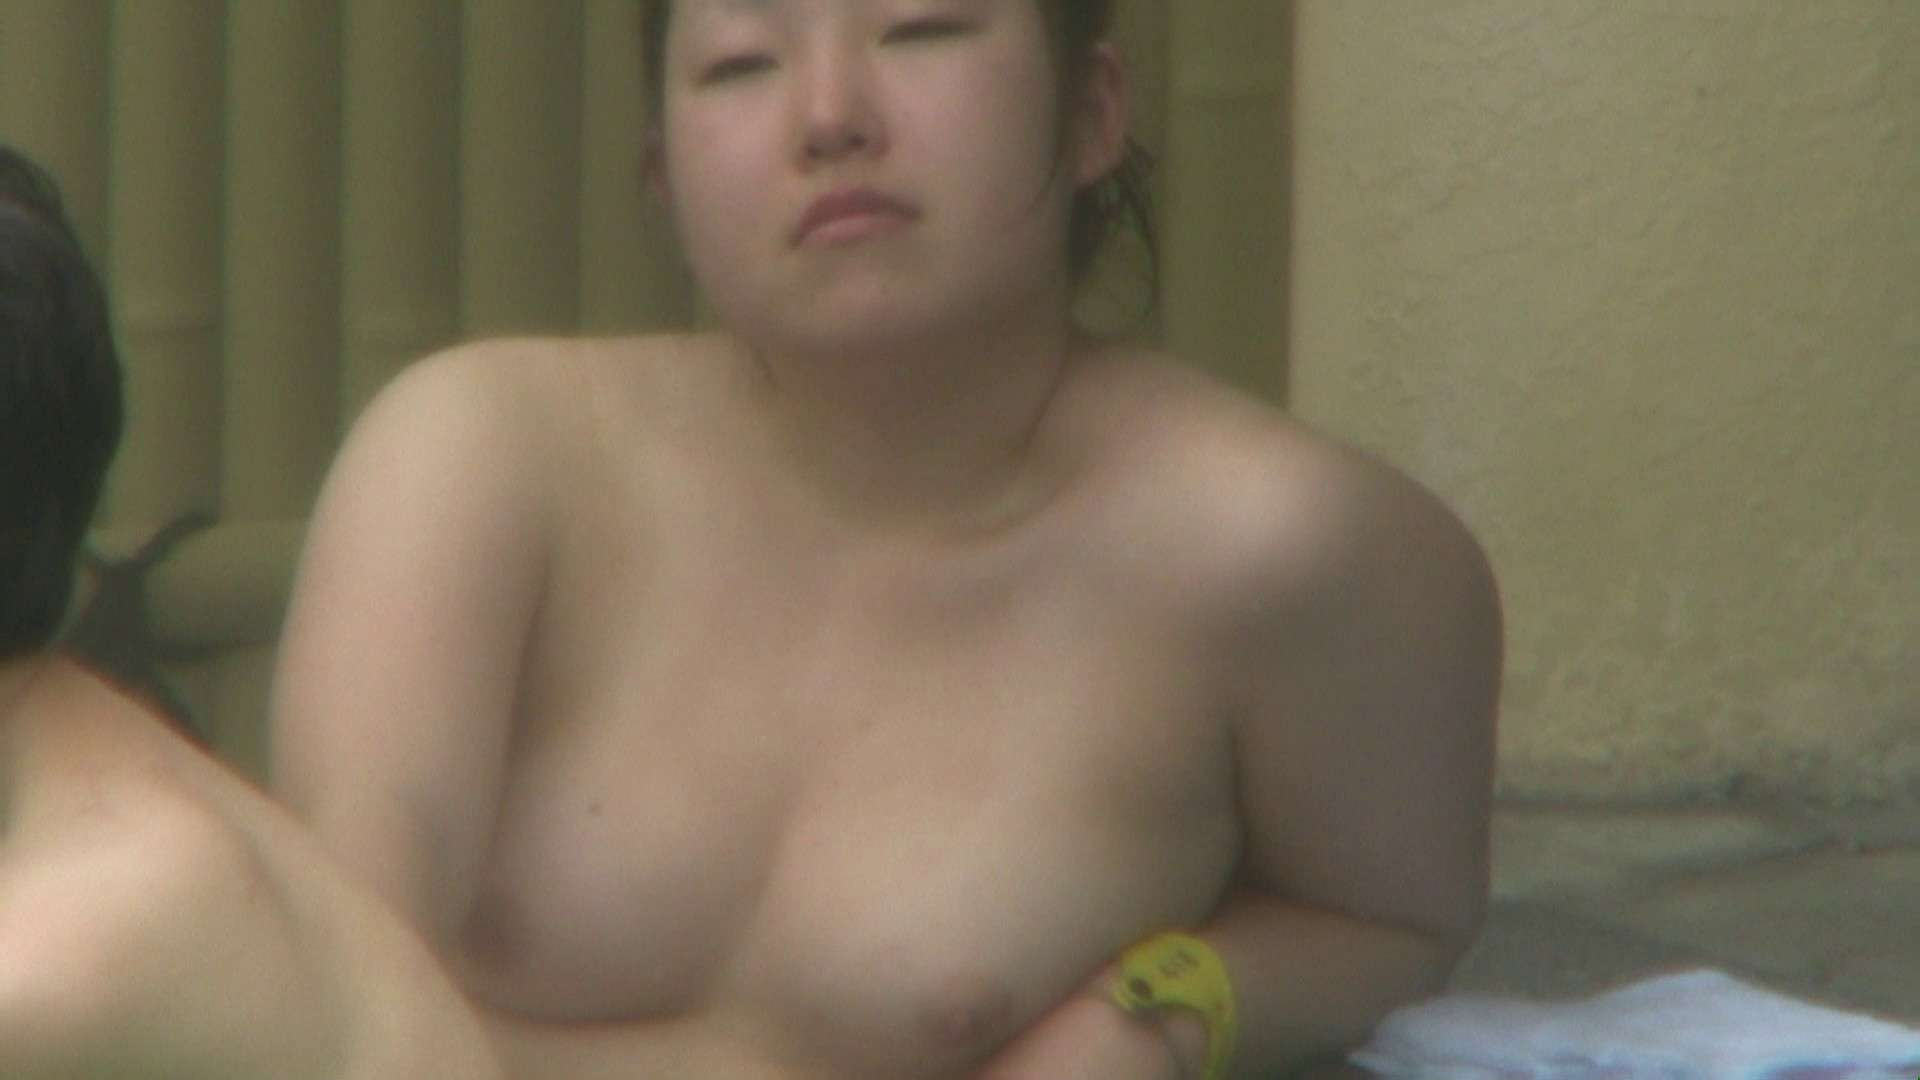 Aquaな露天風呂Vol.72【VIP限定】 露天風呂編  98PIX 46